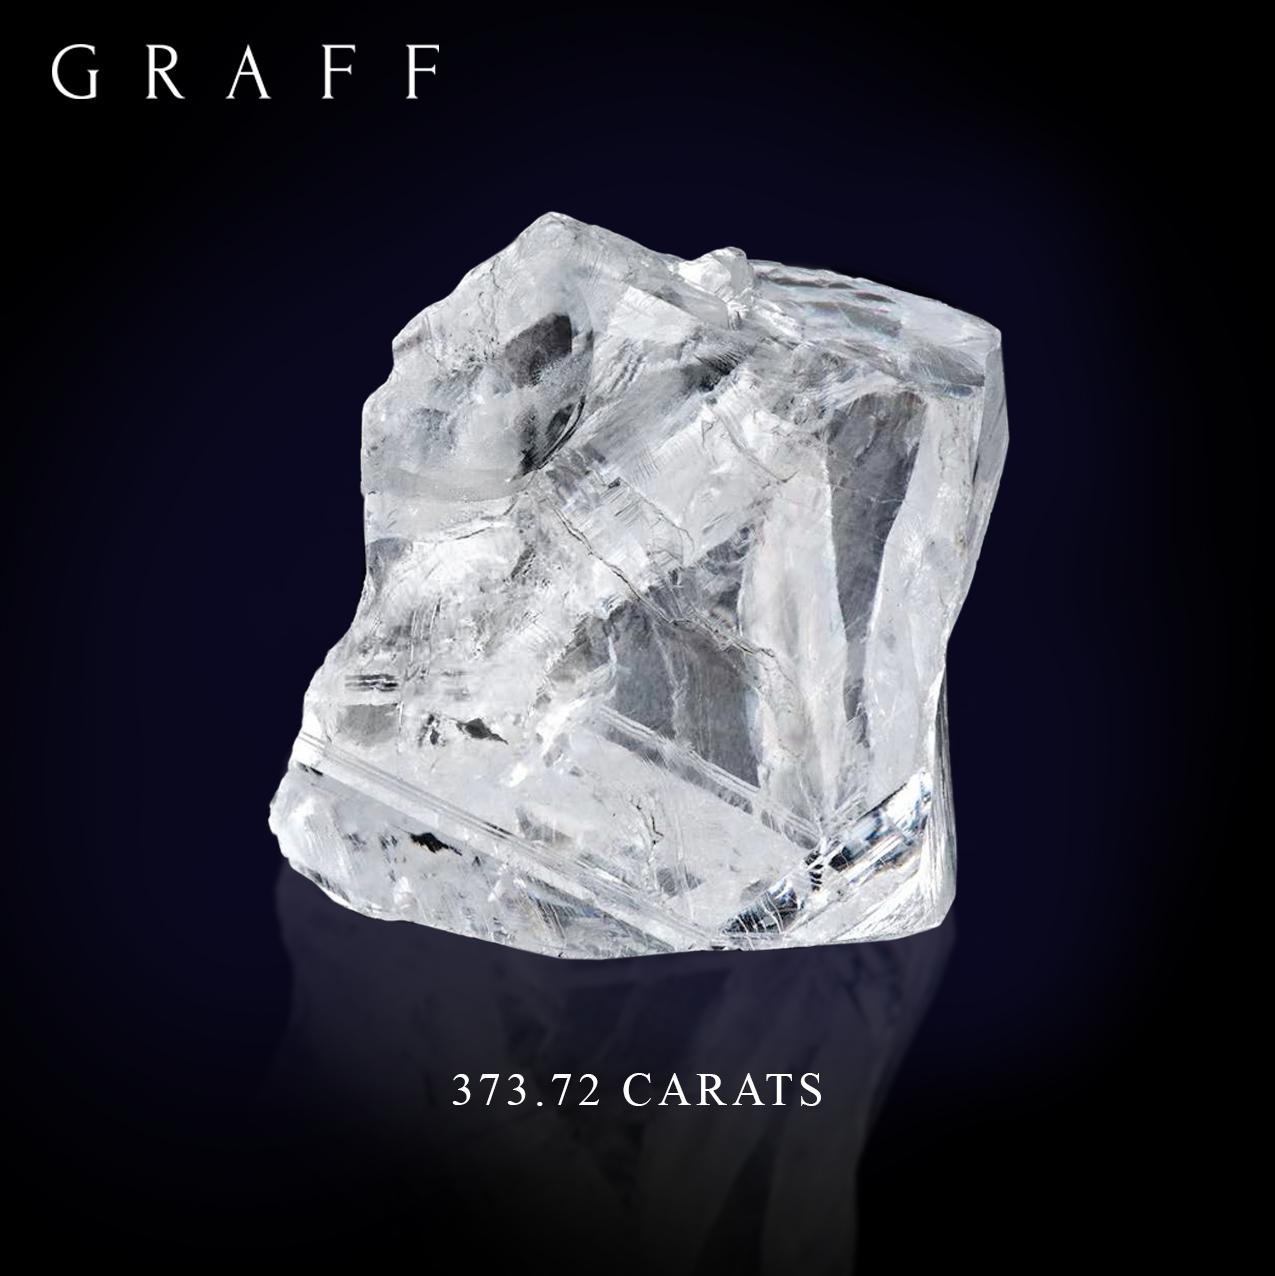 Graff ancient diamond